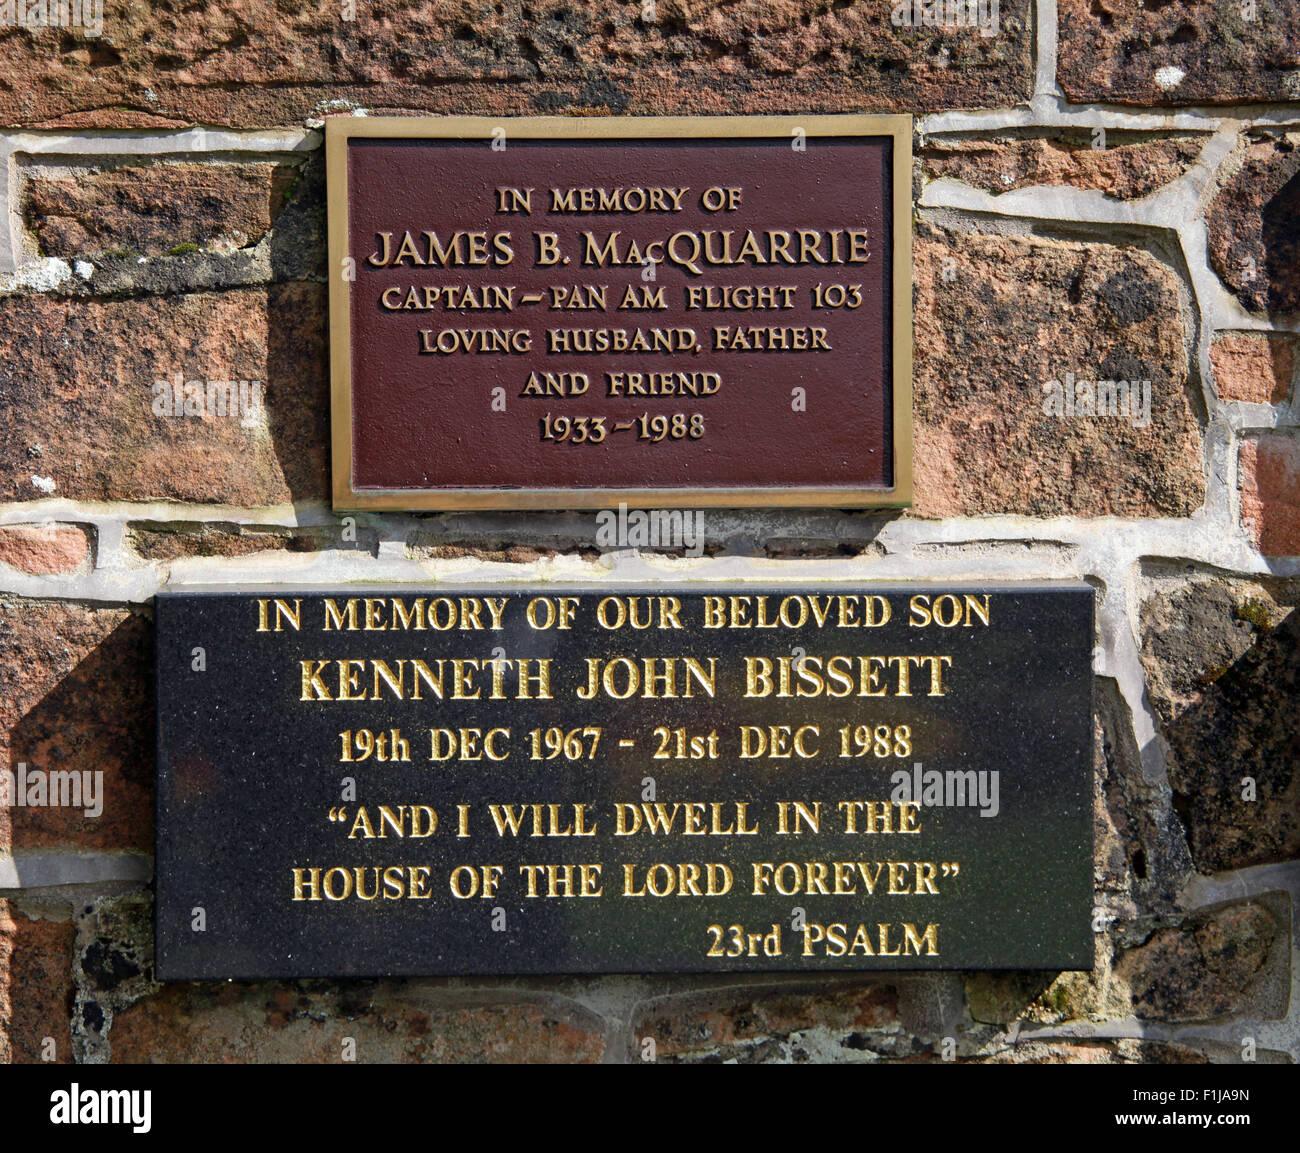 Lockerbie PanAm103 In Rememberance Memorial James B. MacQuarrie Captain Kenneth John Bissett, Scotland - Stock Image